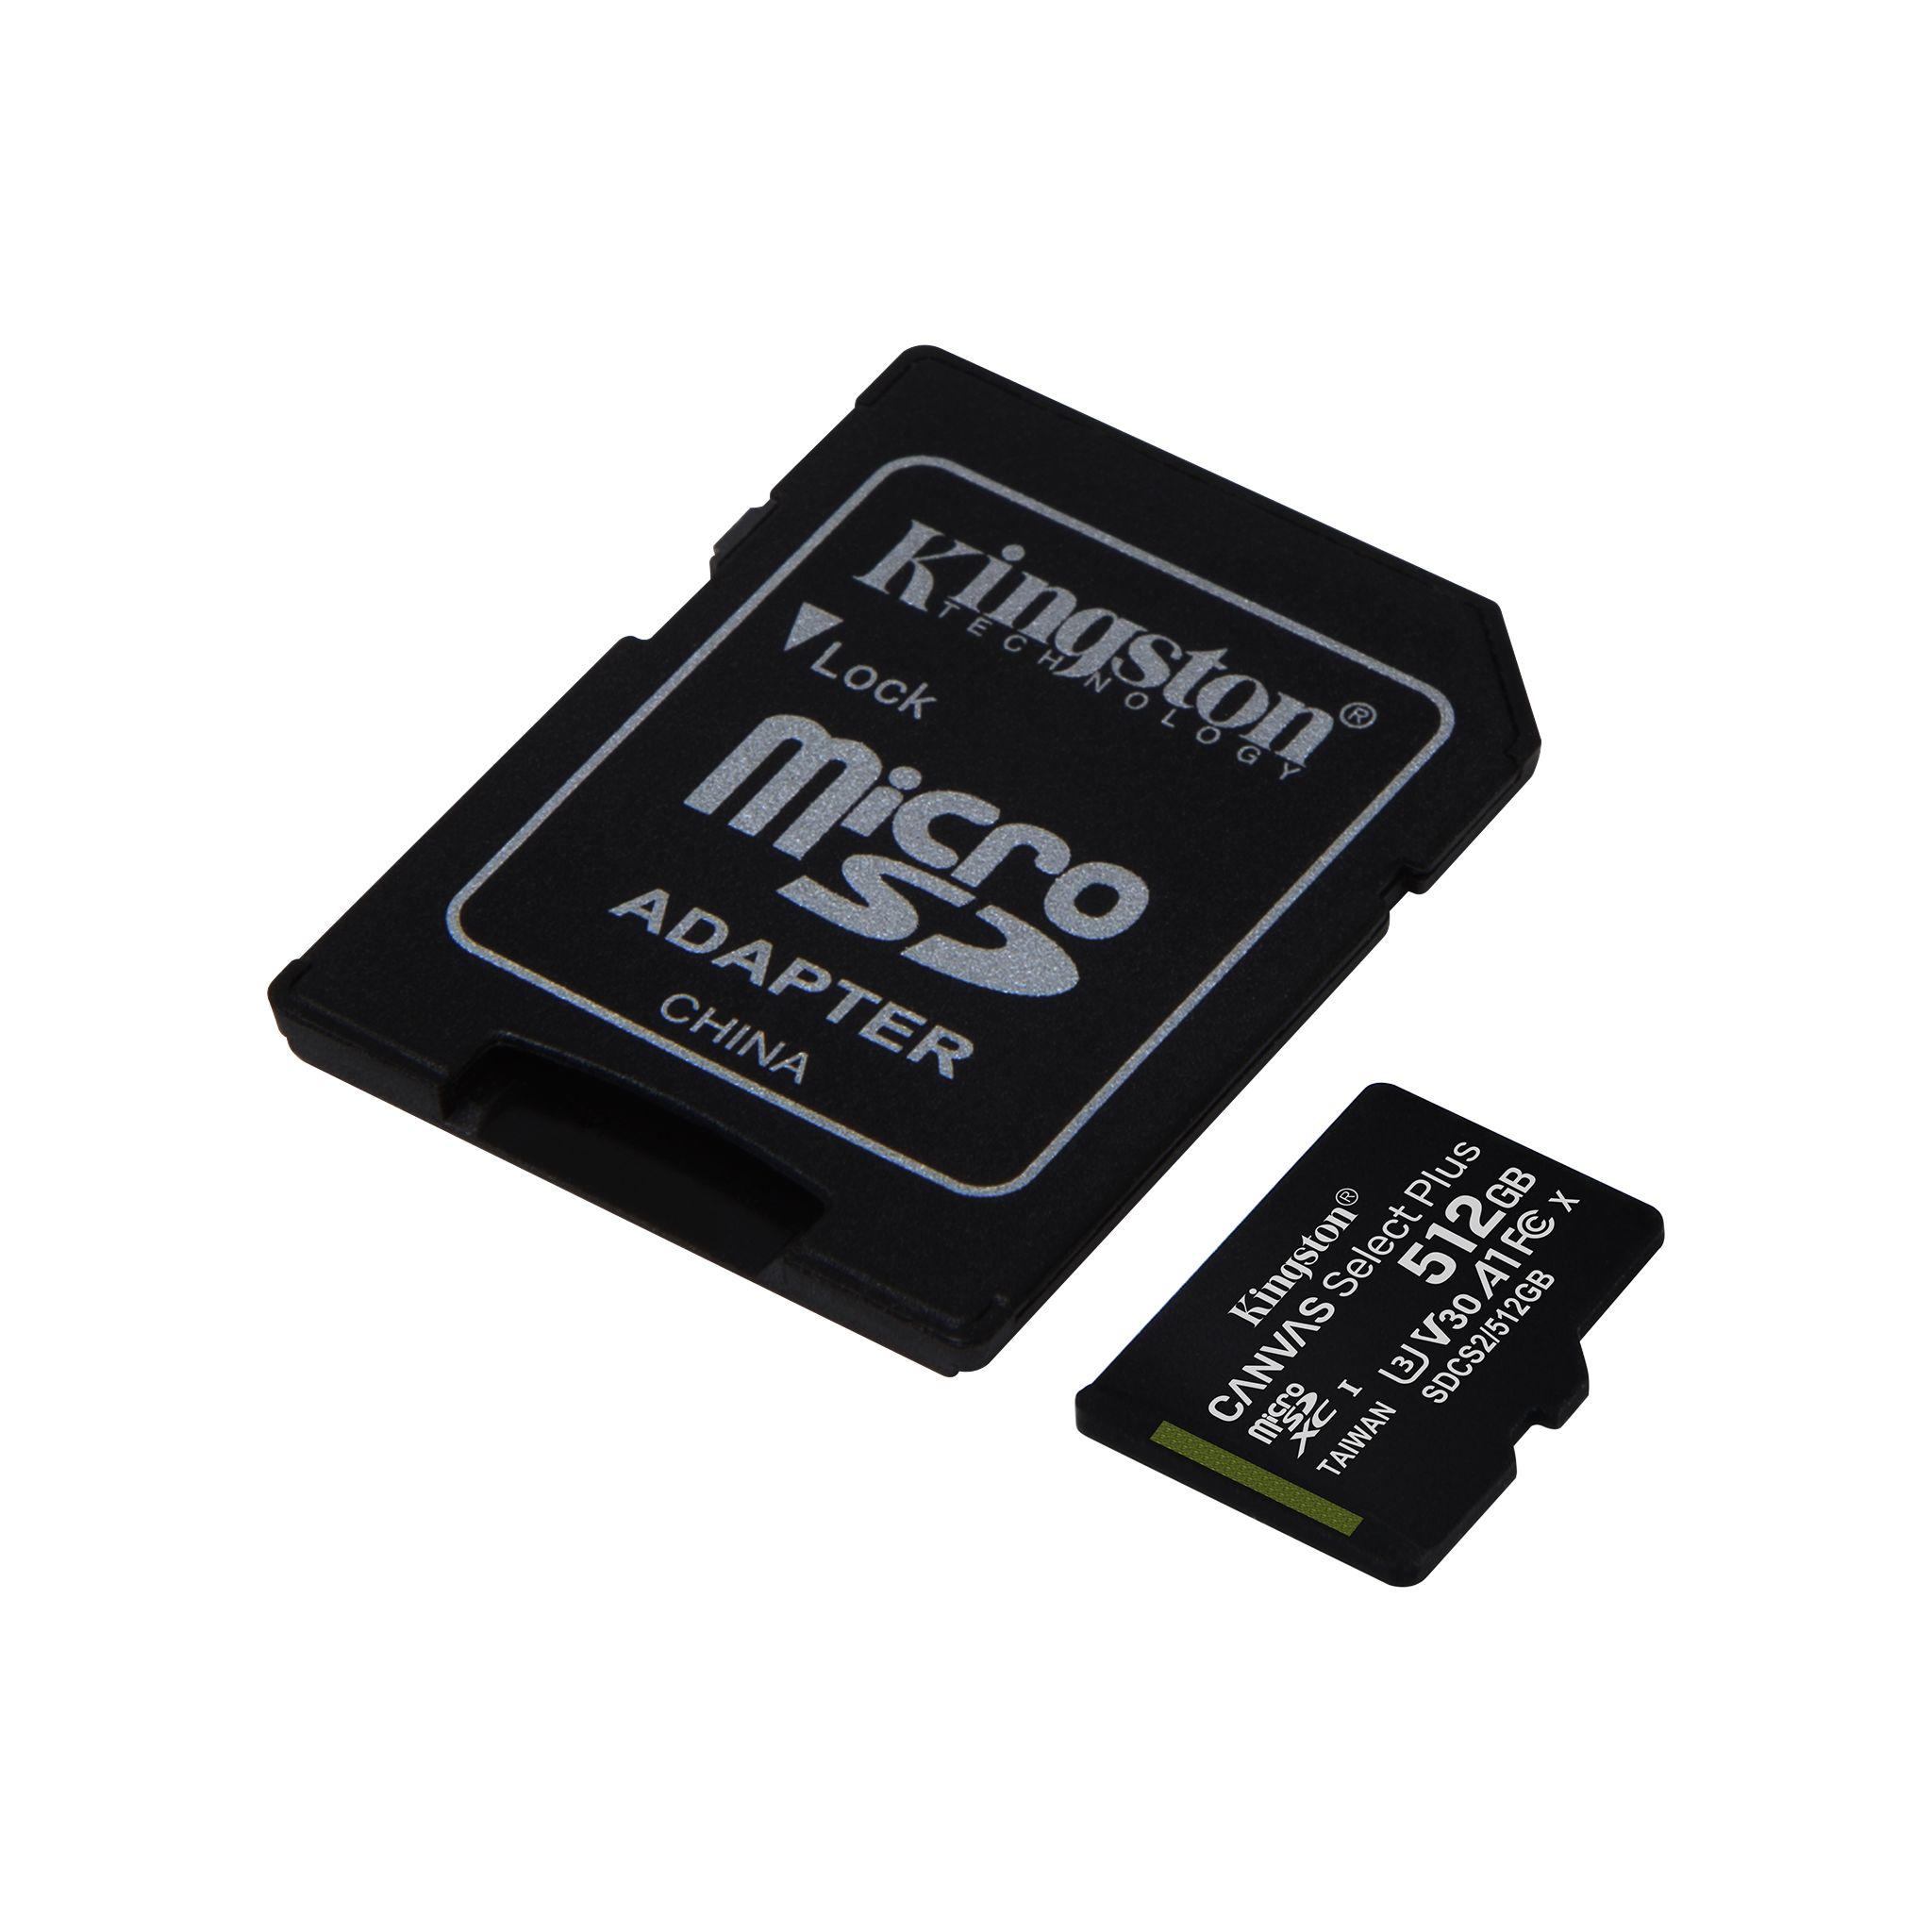 Kingston 32GB Nokia Lumia 1520 Mini MicroSDHC Canvas Select Plus Card Verified by SanFlash. 100MBs Works with Kingston